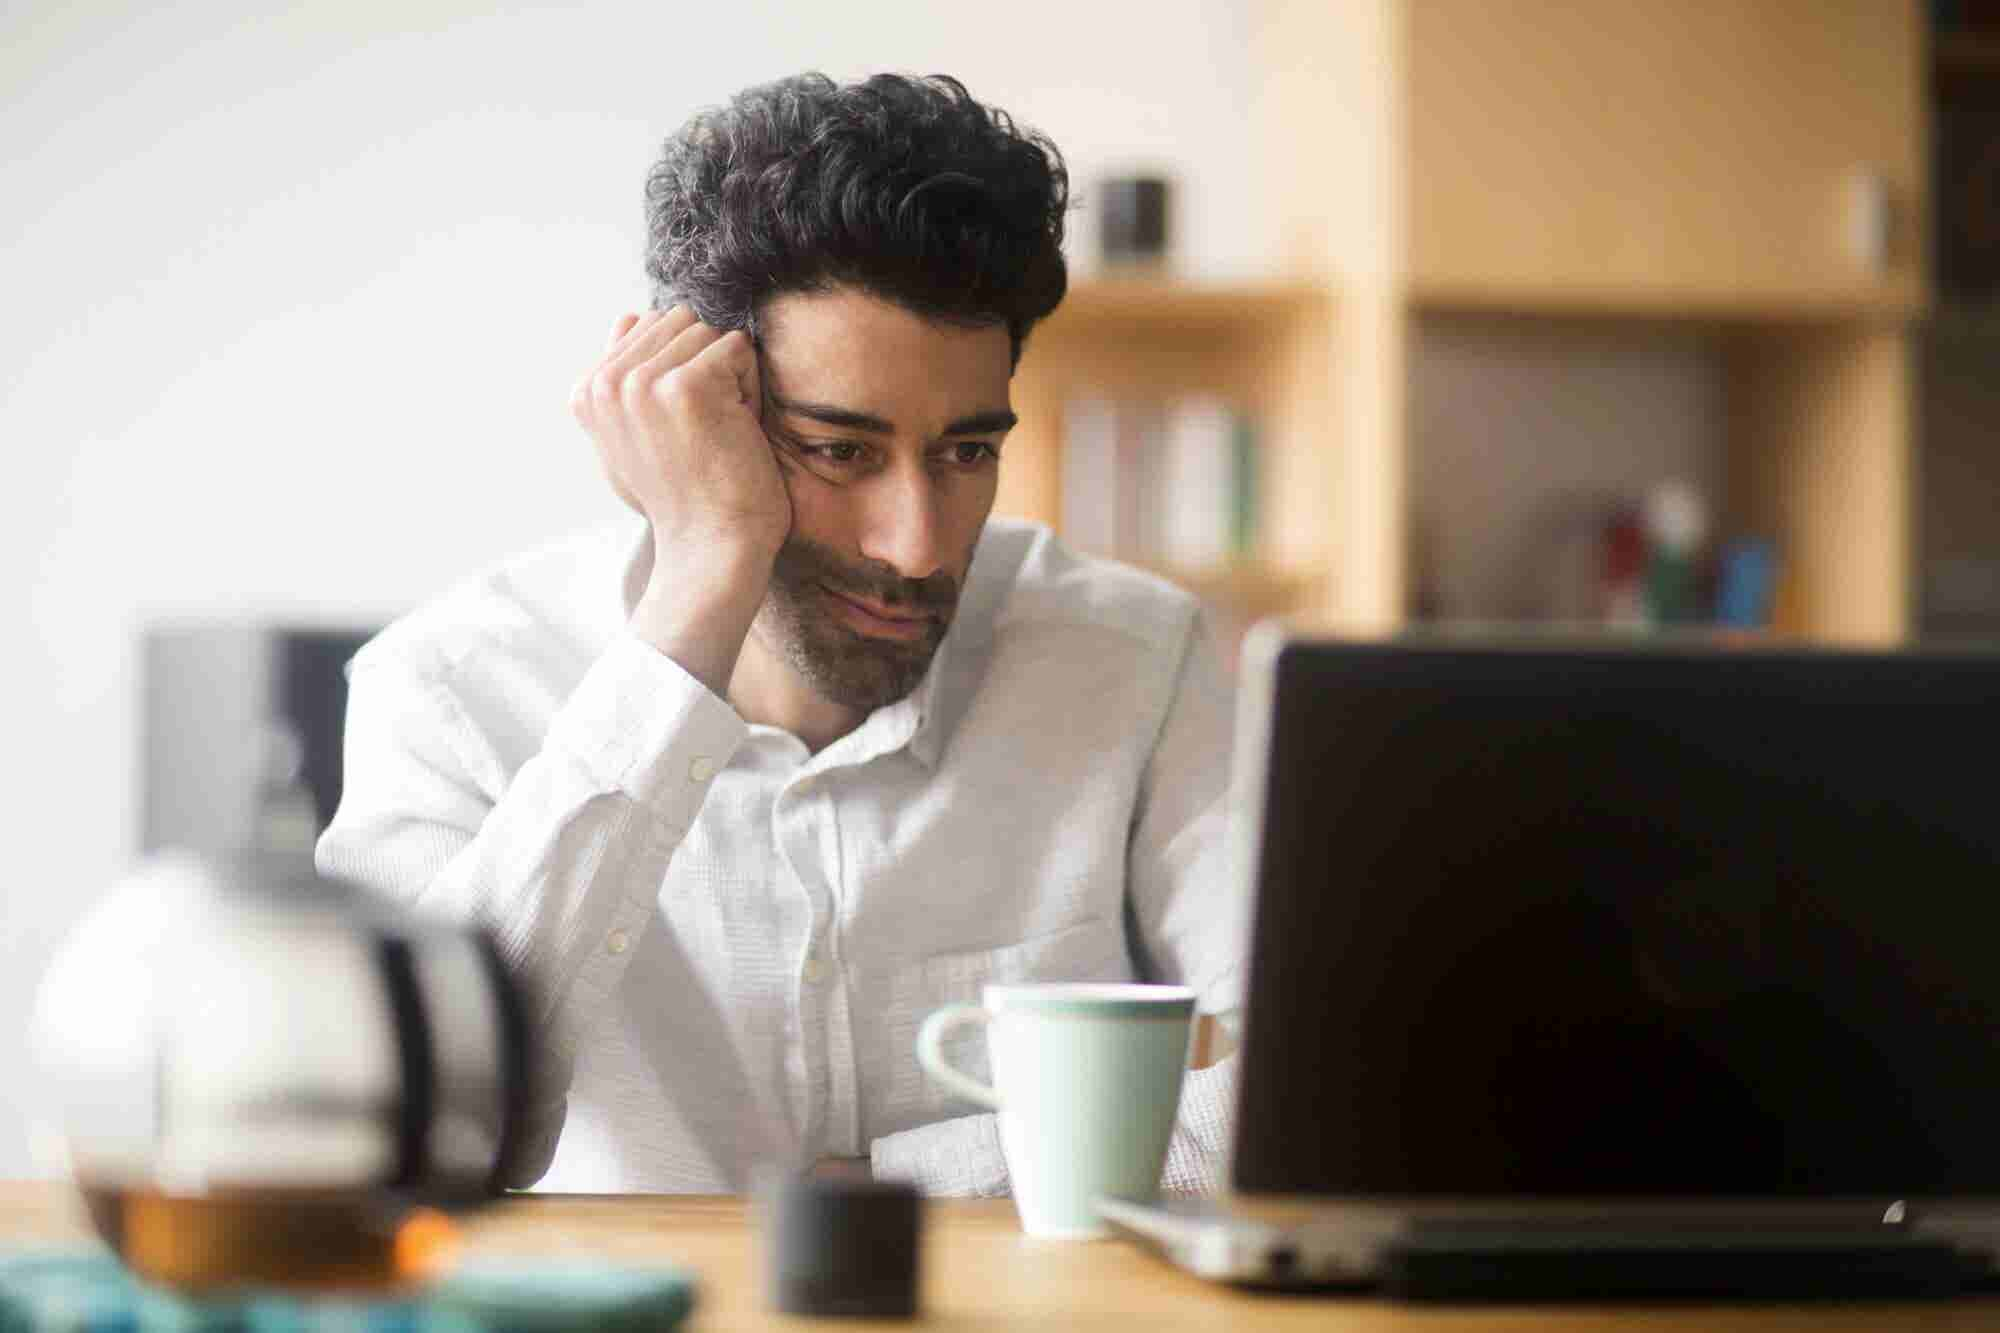 Anonymous Online Detractors Shattering Your Confidence?